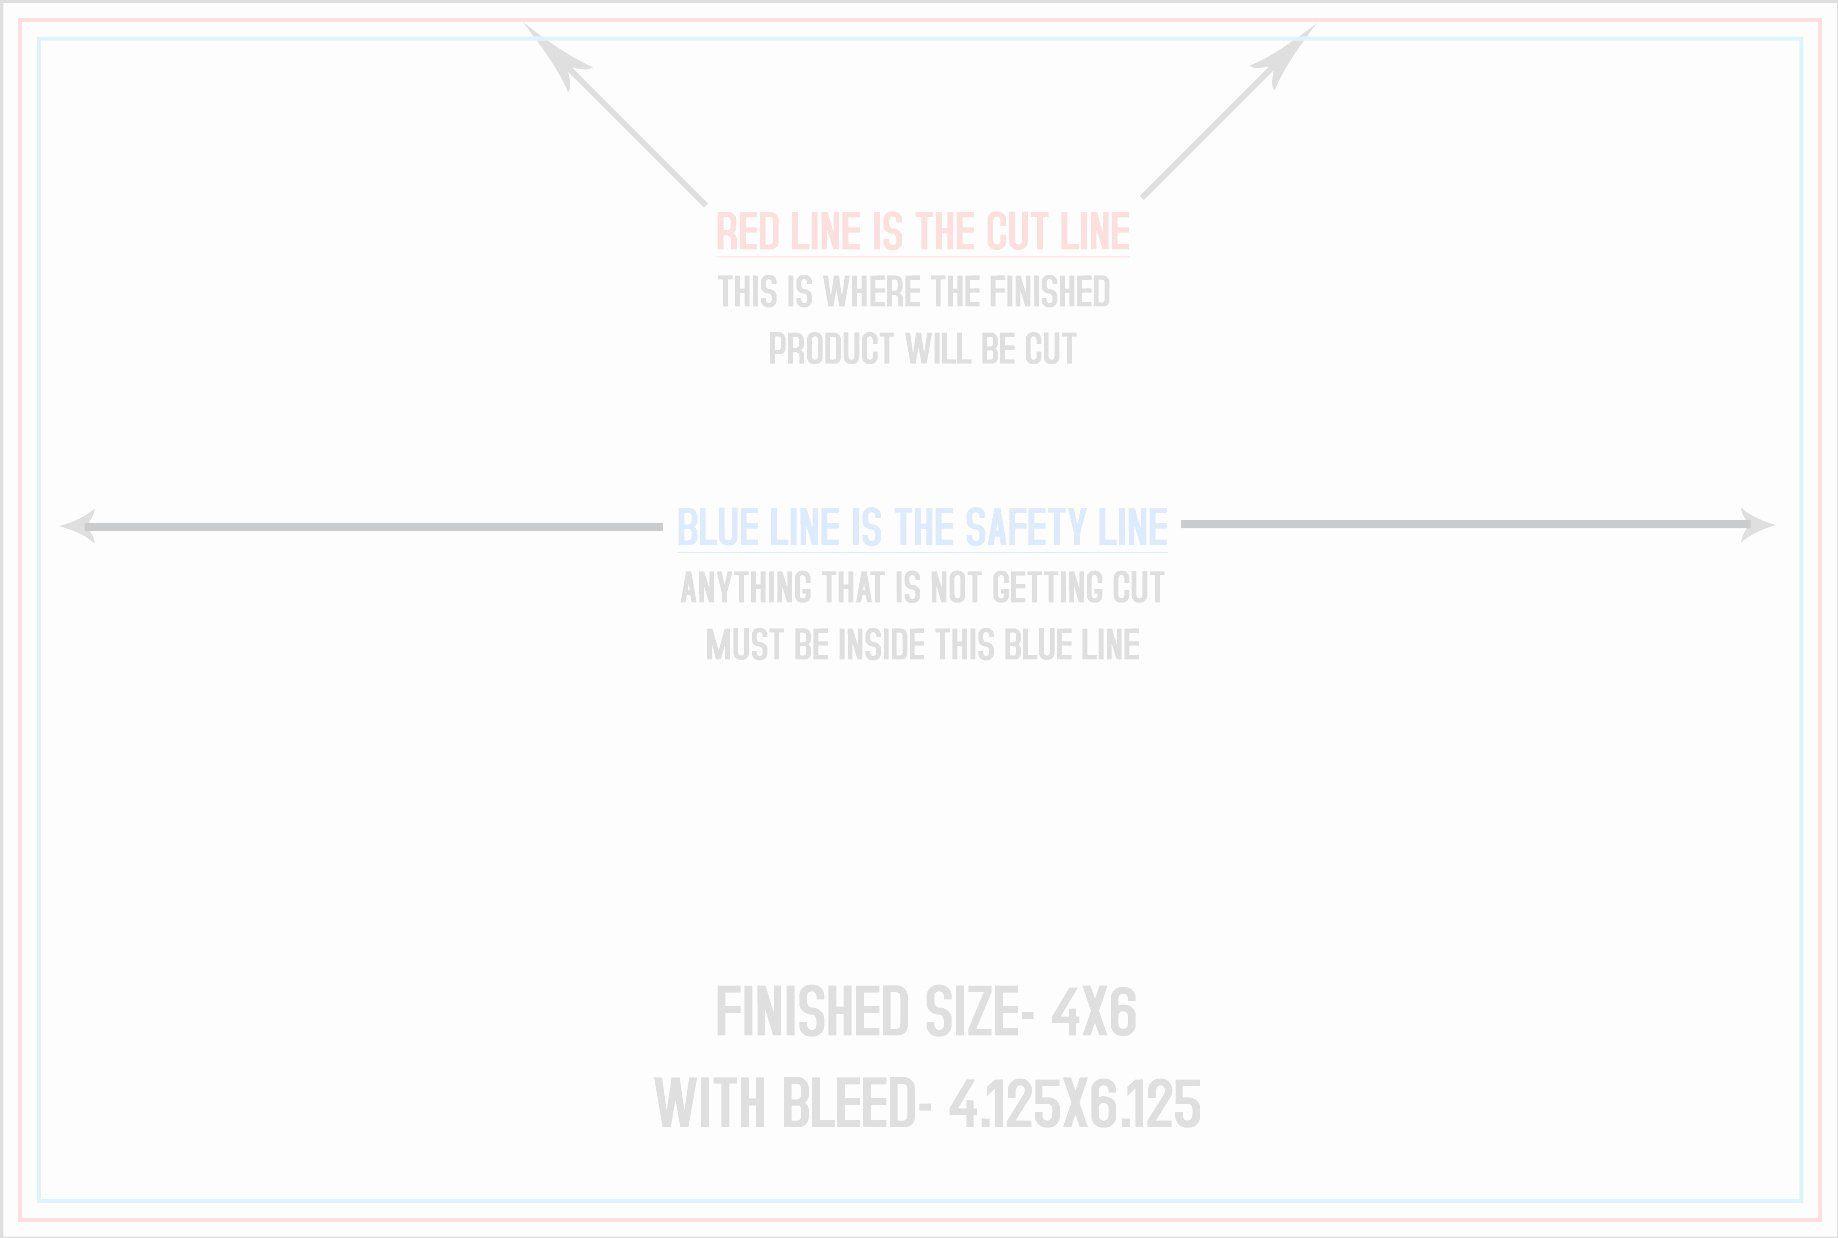 4x6 Index Card Template Beautiful 4 X 6 Templates Card Templates Printable Card Template Party Invite Template